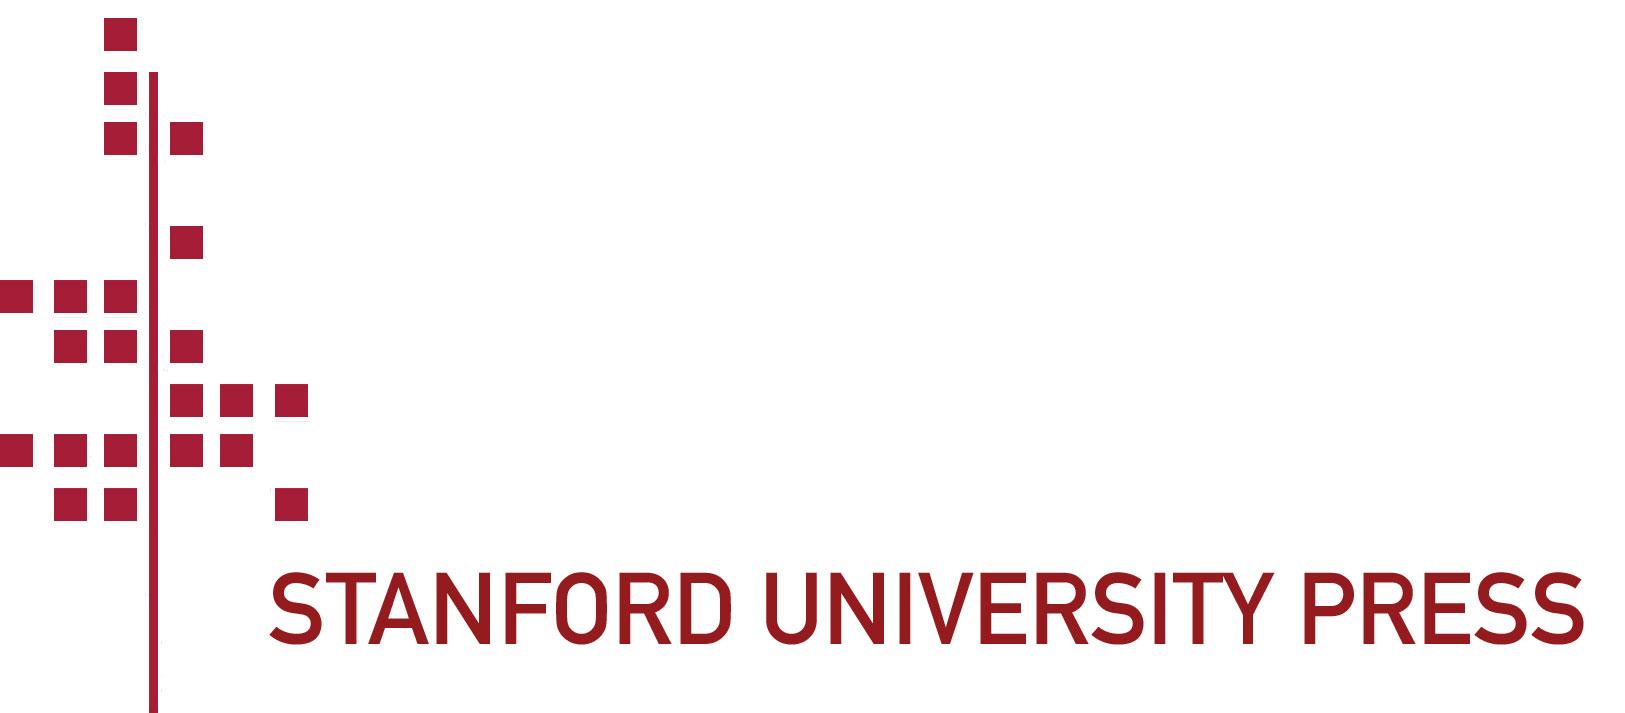 Stanford University Press Blog